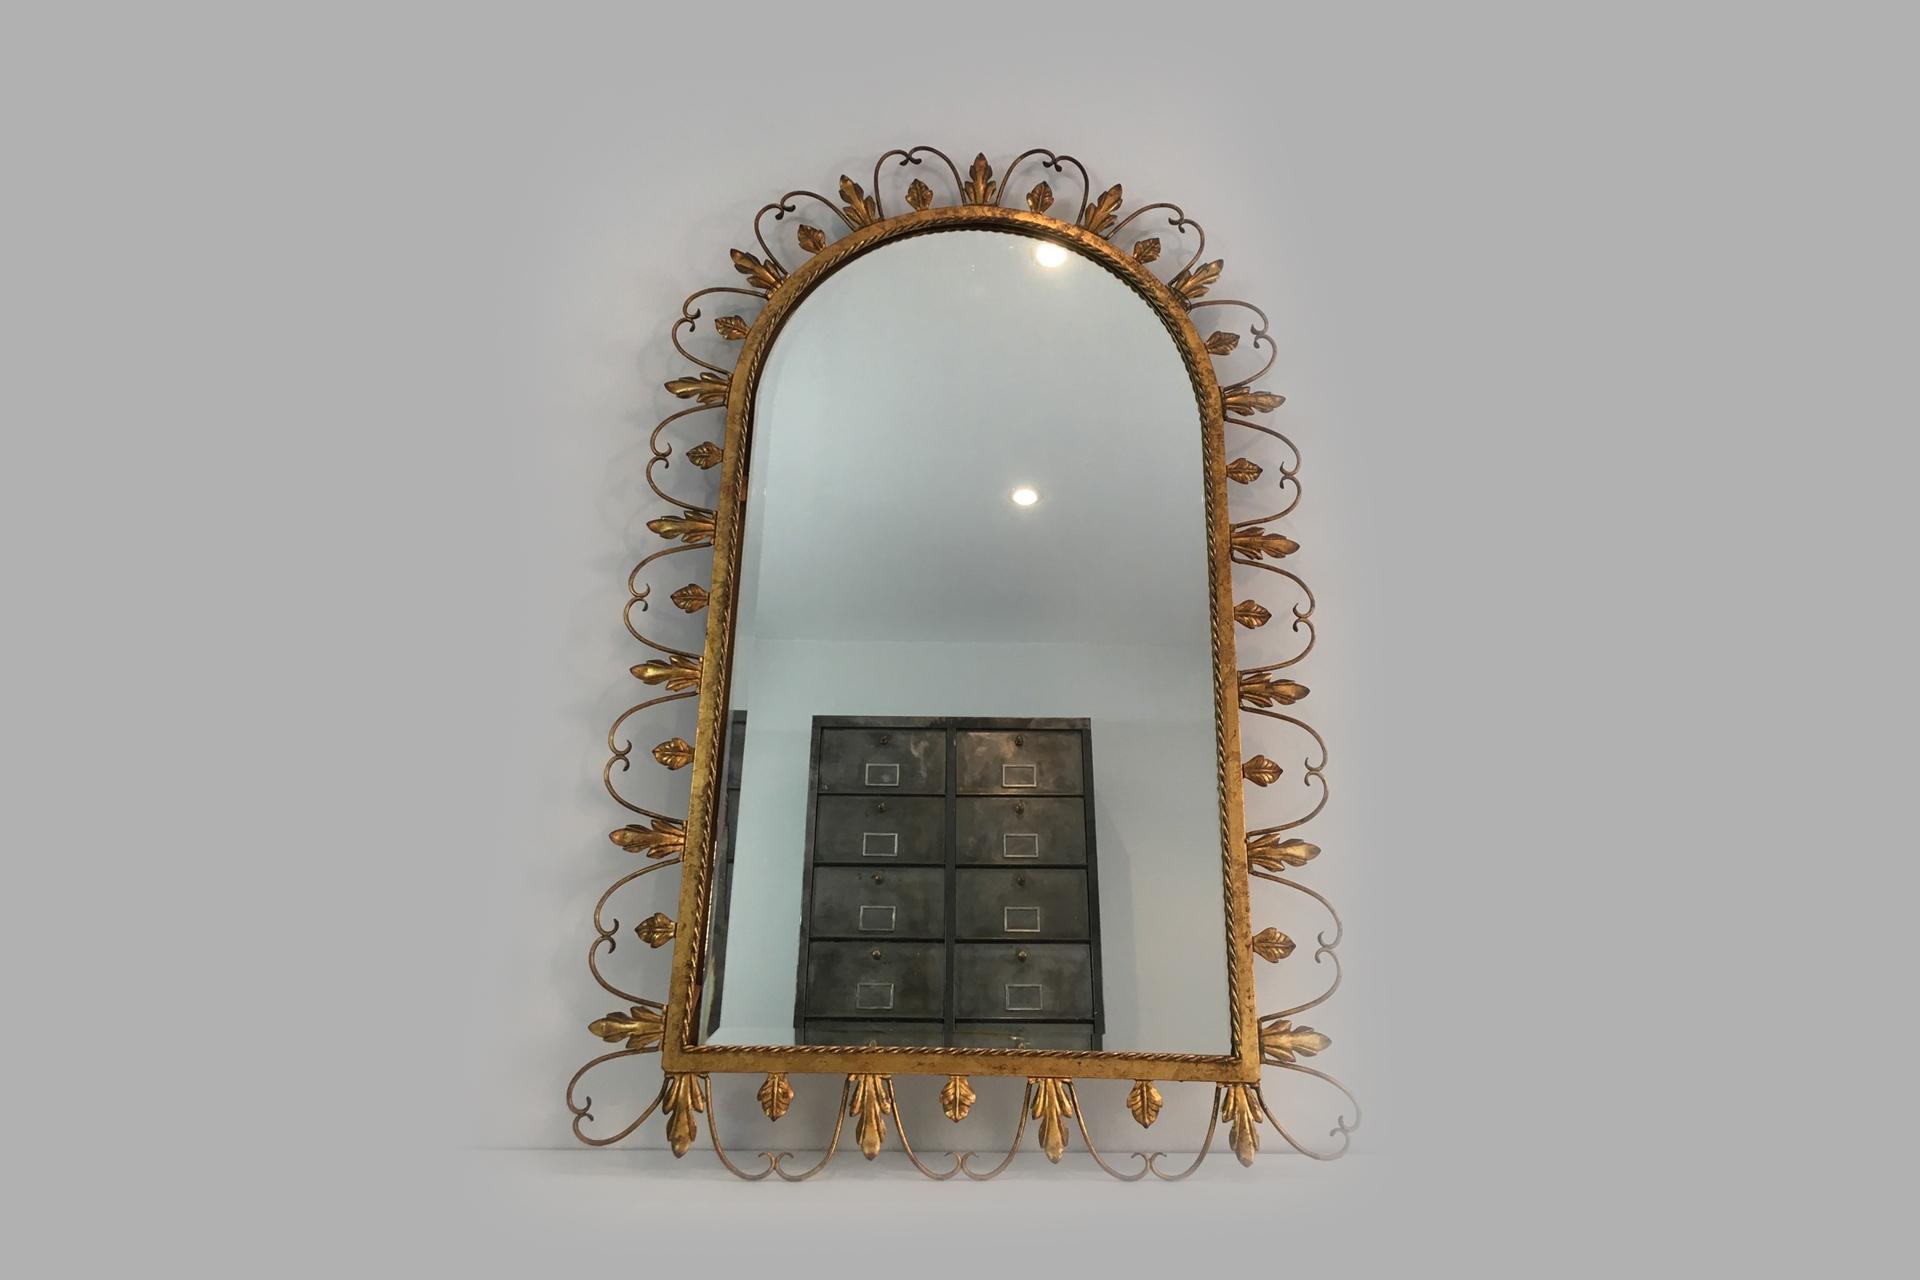 Altın Ferforje Ayna Modeli